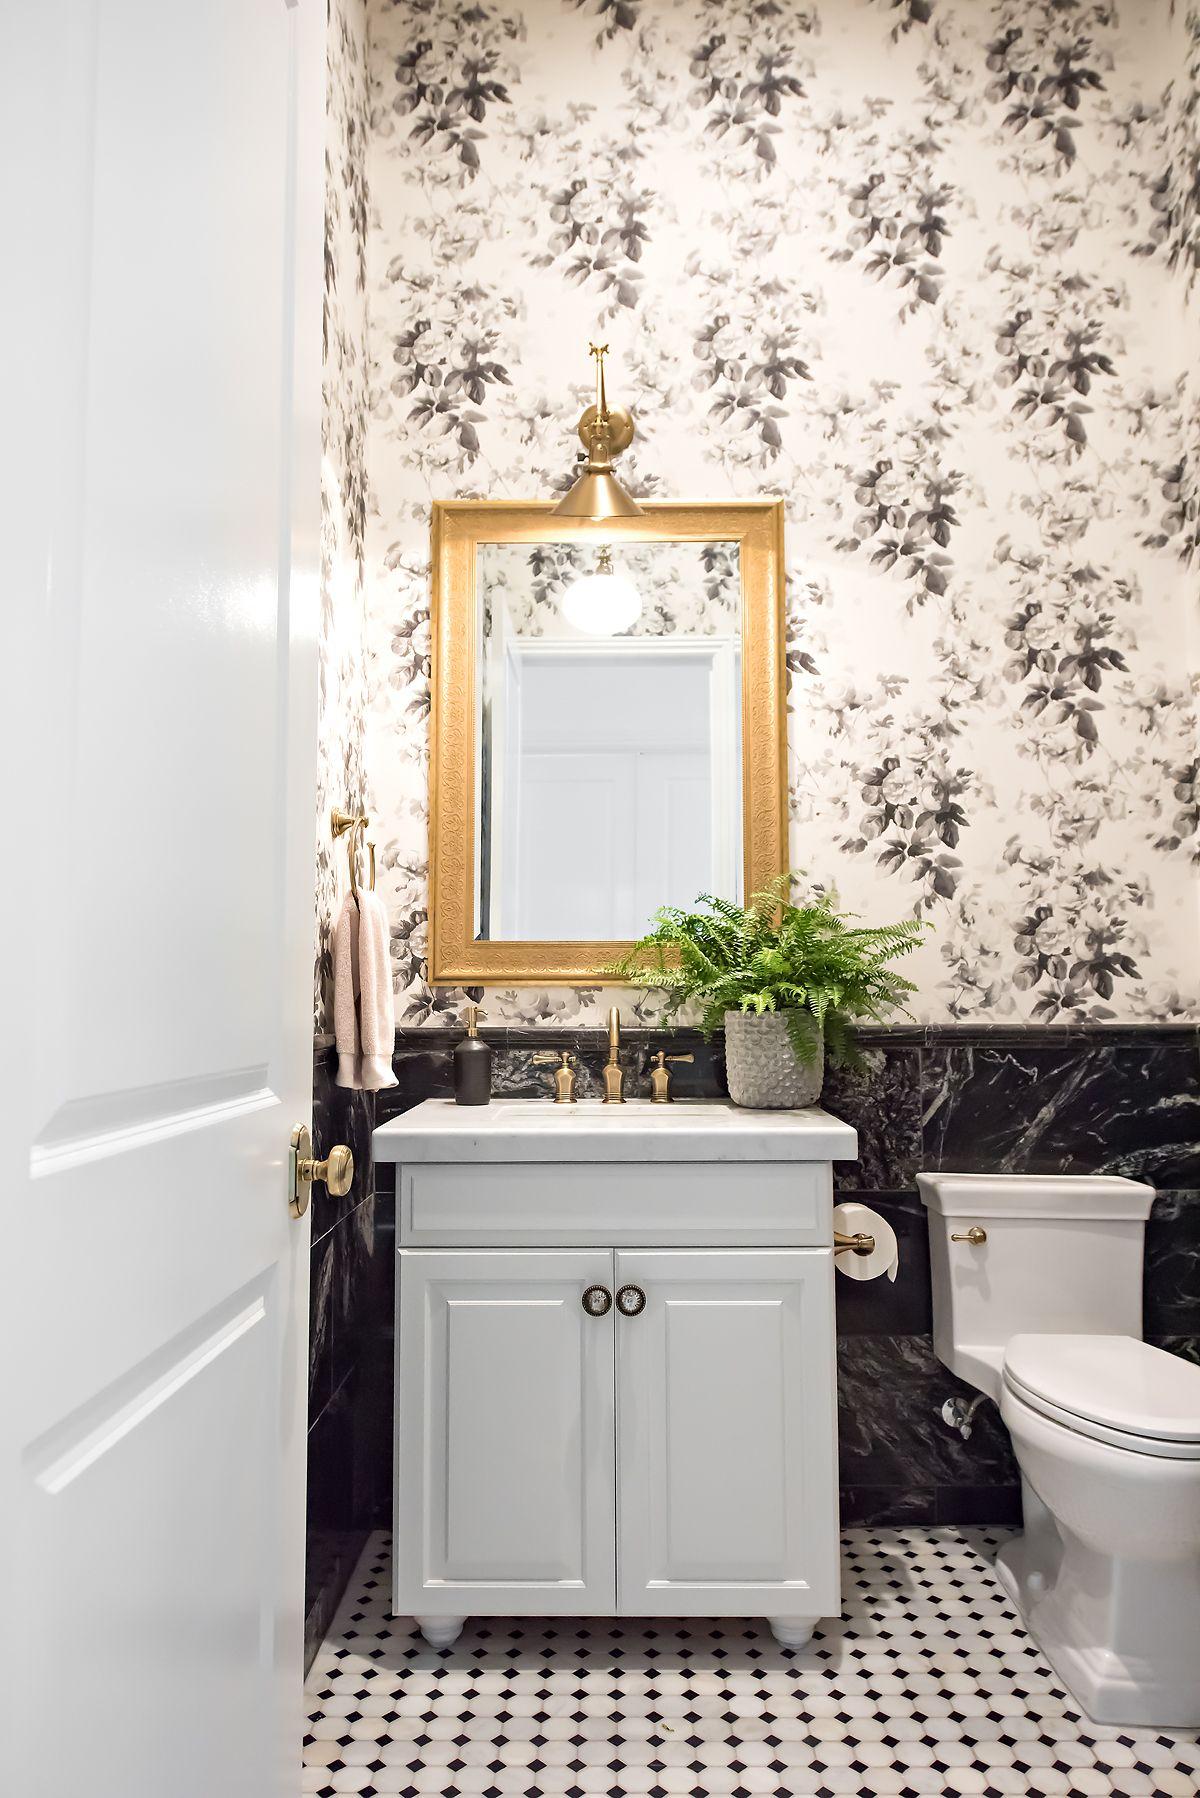 New Home Tour >> Powder Bathroom | W | 卫 | Pinterest | Powder room ...